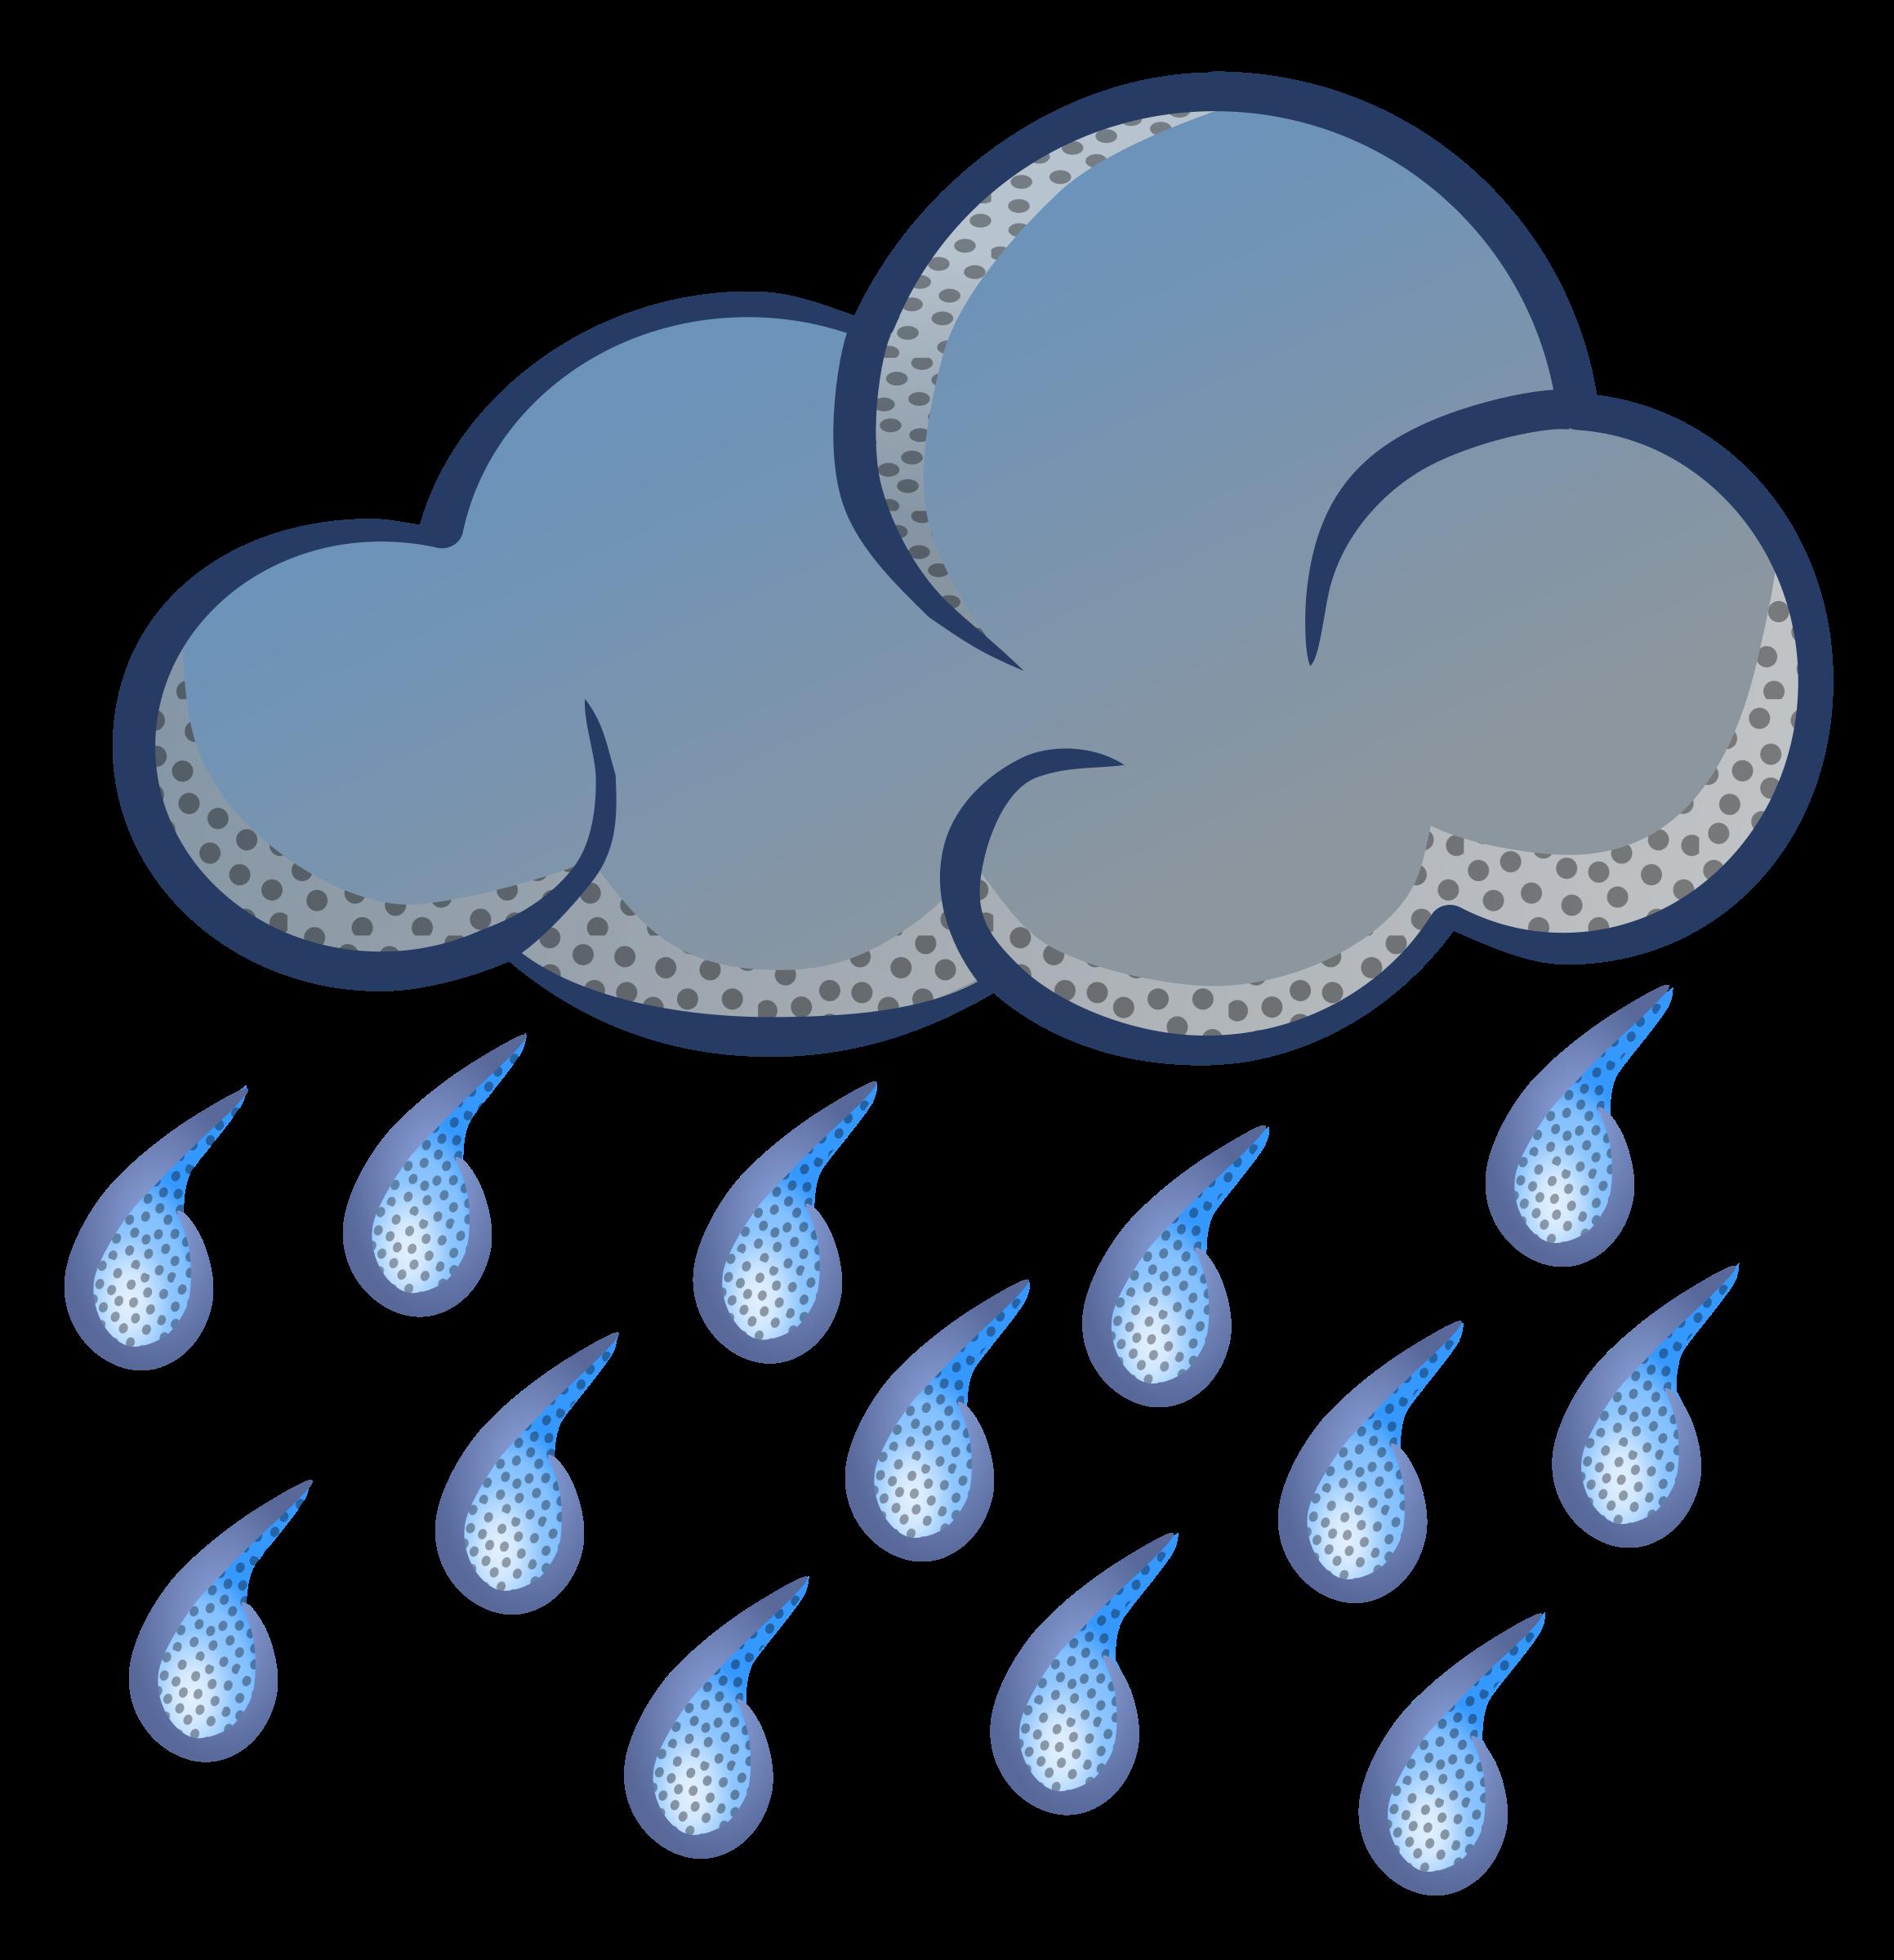 Rain clipart Clipart clouds Clip com image